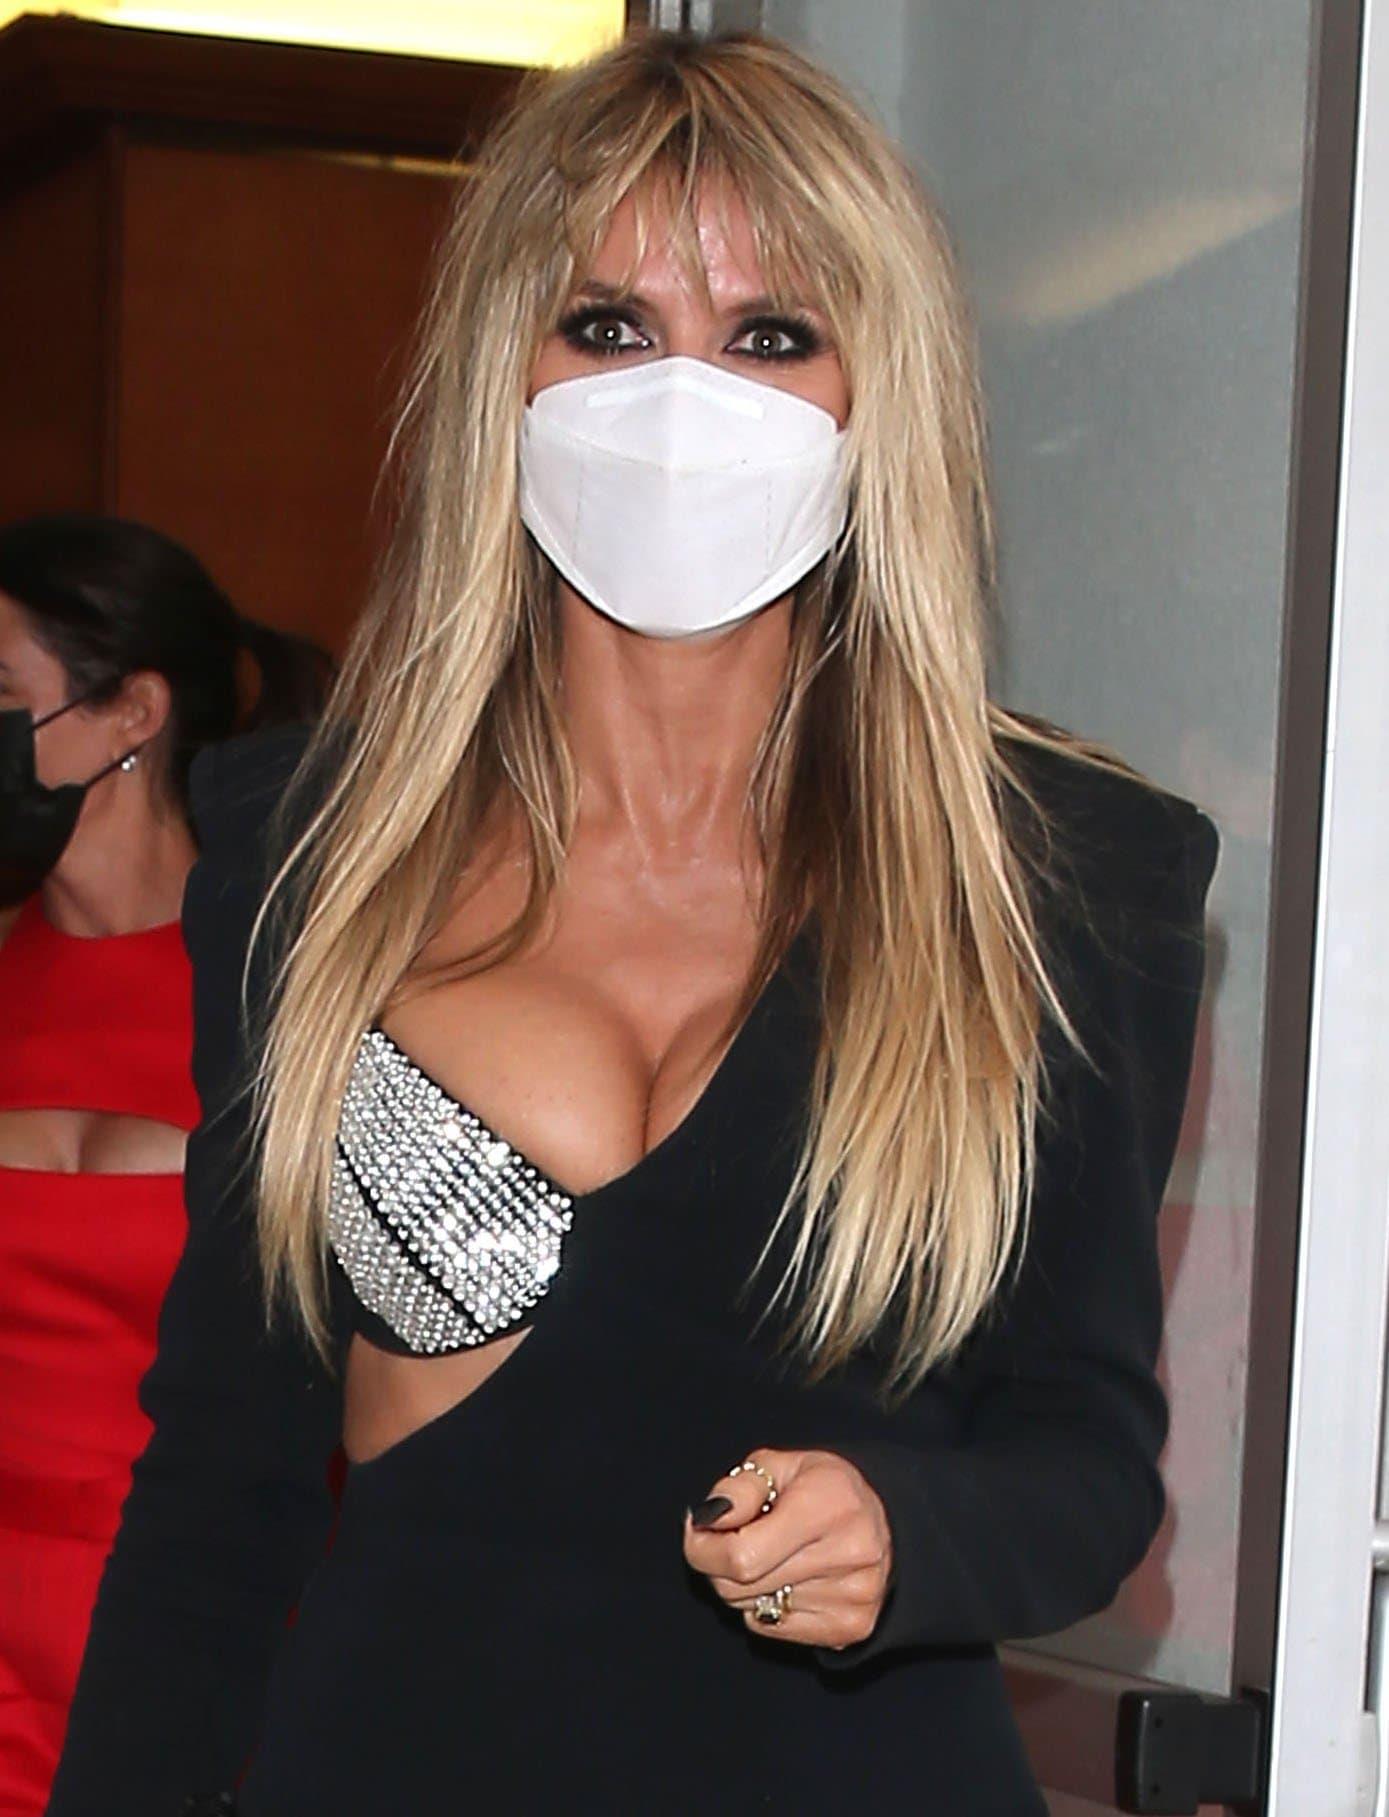 Heidi Klum wears her blonde hair straight and adds dramatic smokey eye-makeup to the look